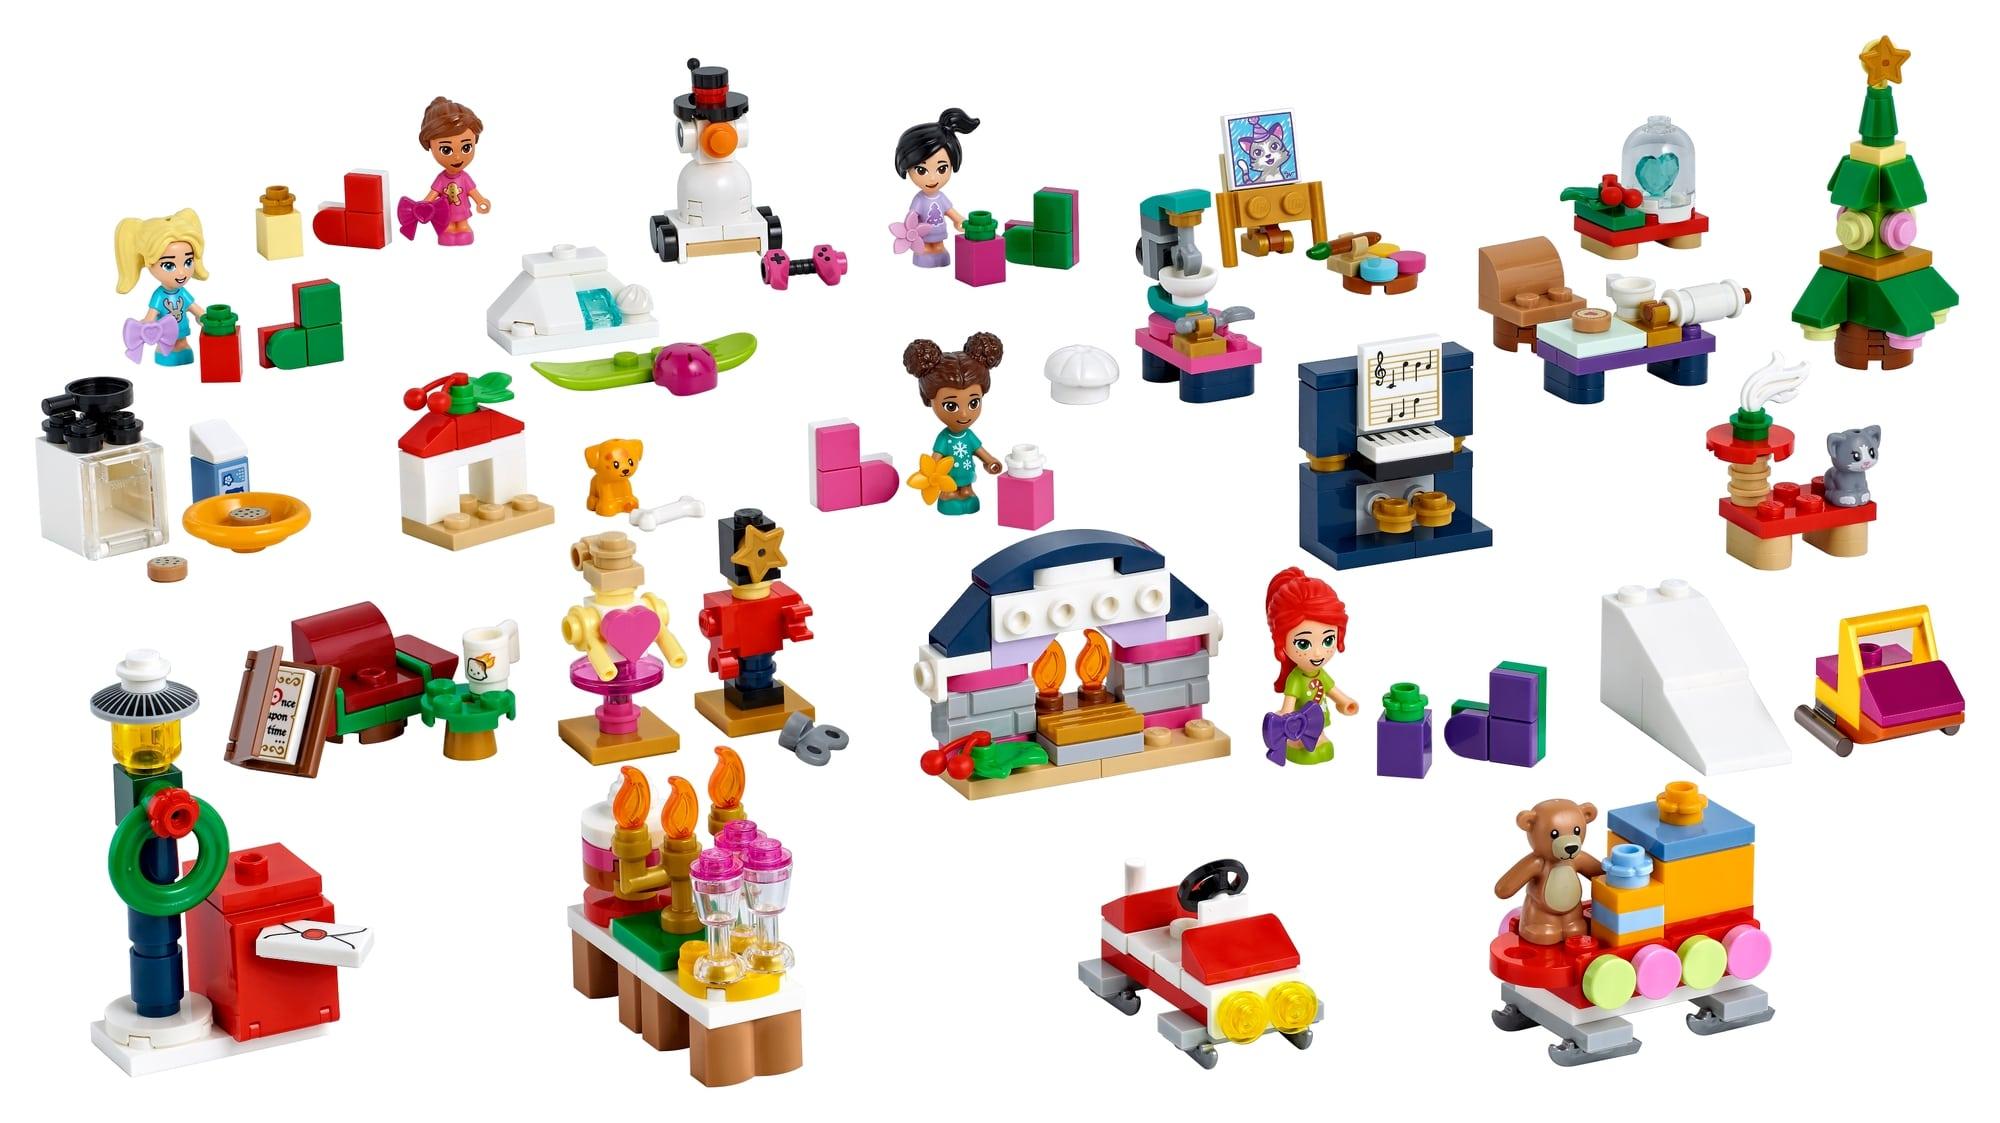 LEGO Friends 41690 LEGO Friends Adventskalender 2